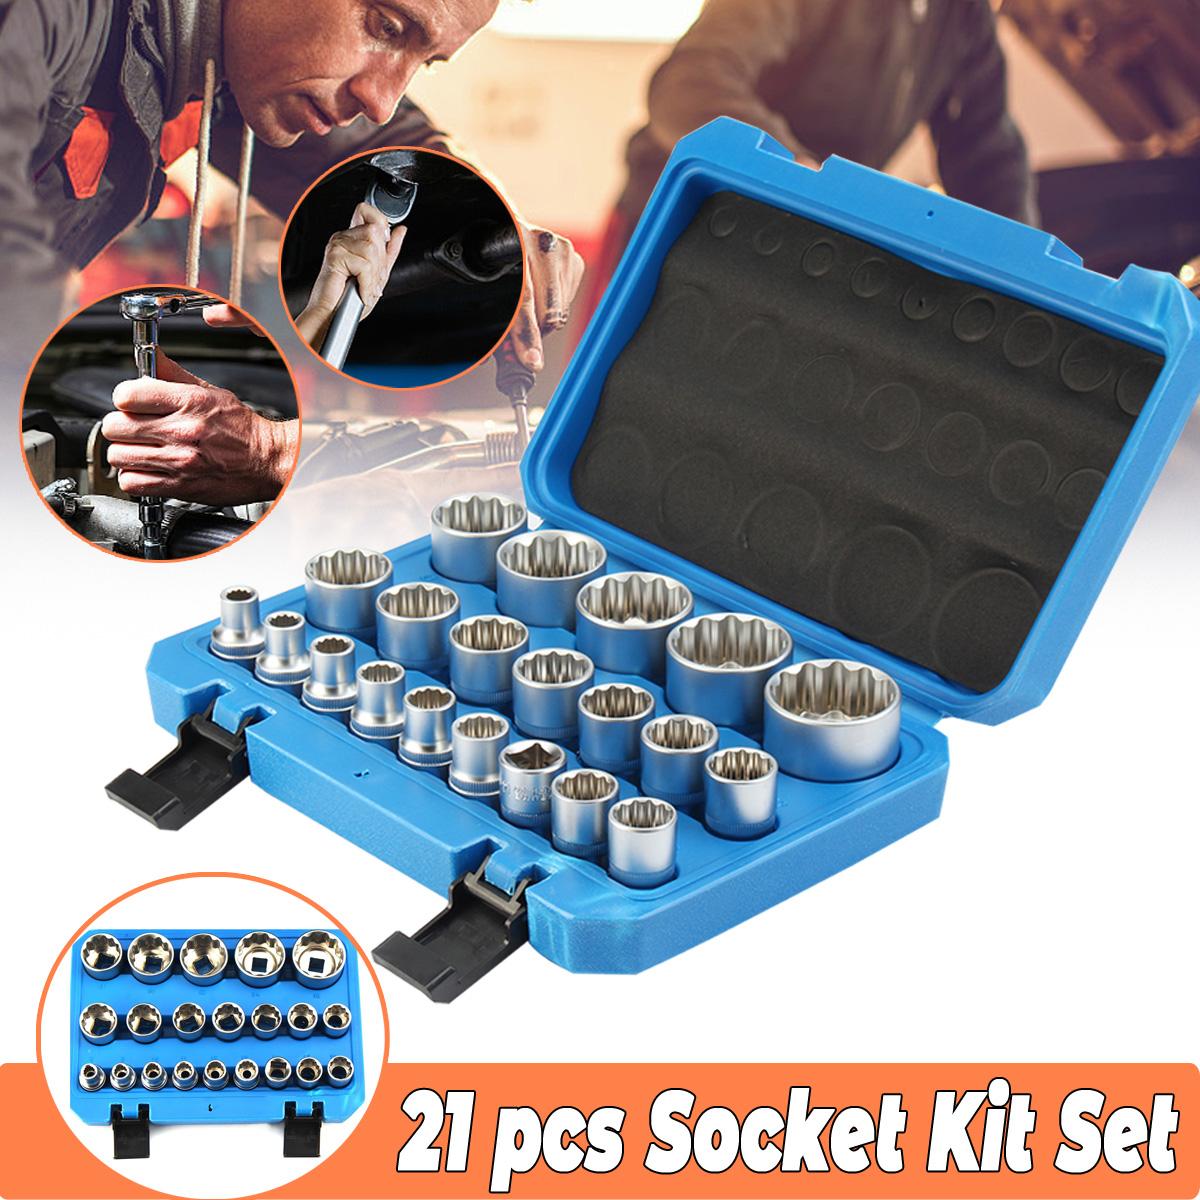 21Pcs 1/2'' Inch Drive Shallow 12P Socket Set 8mm - 36mm Garage Workshop Tool